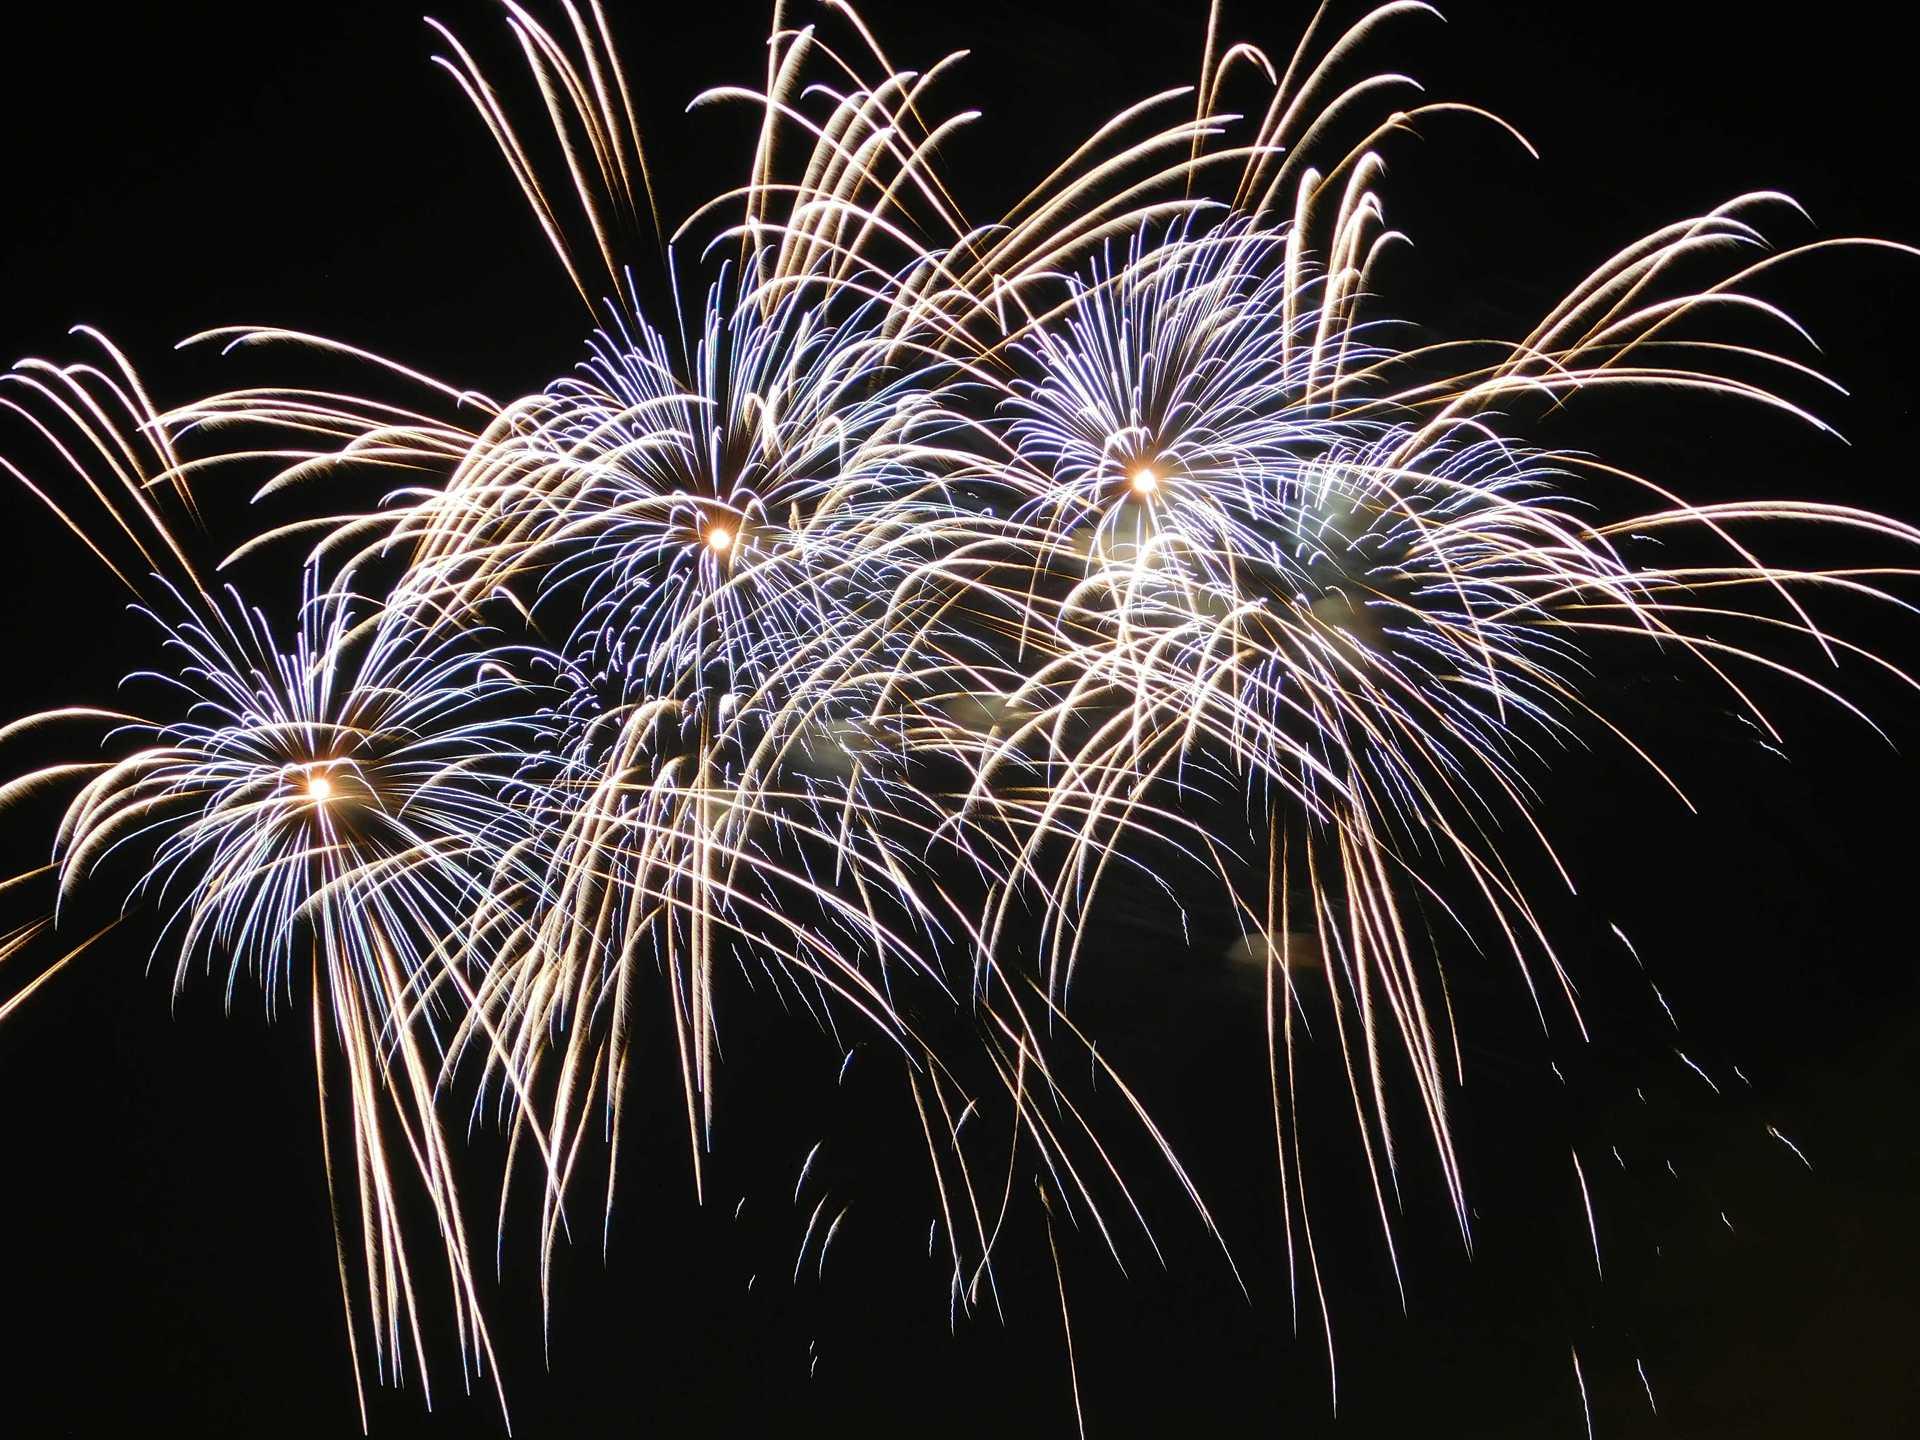 Fireworks | rick.cognyl.fournier, fireworks, no person, color